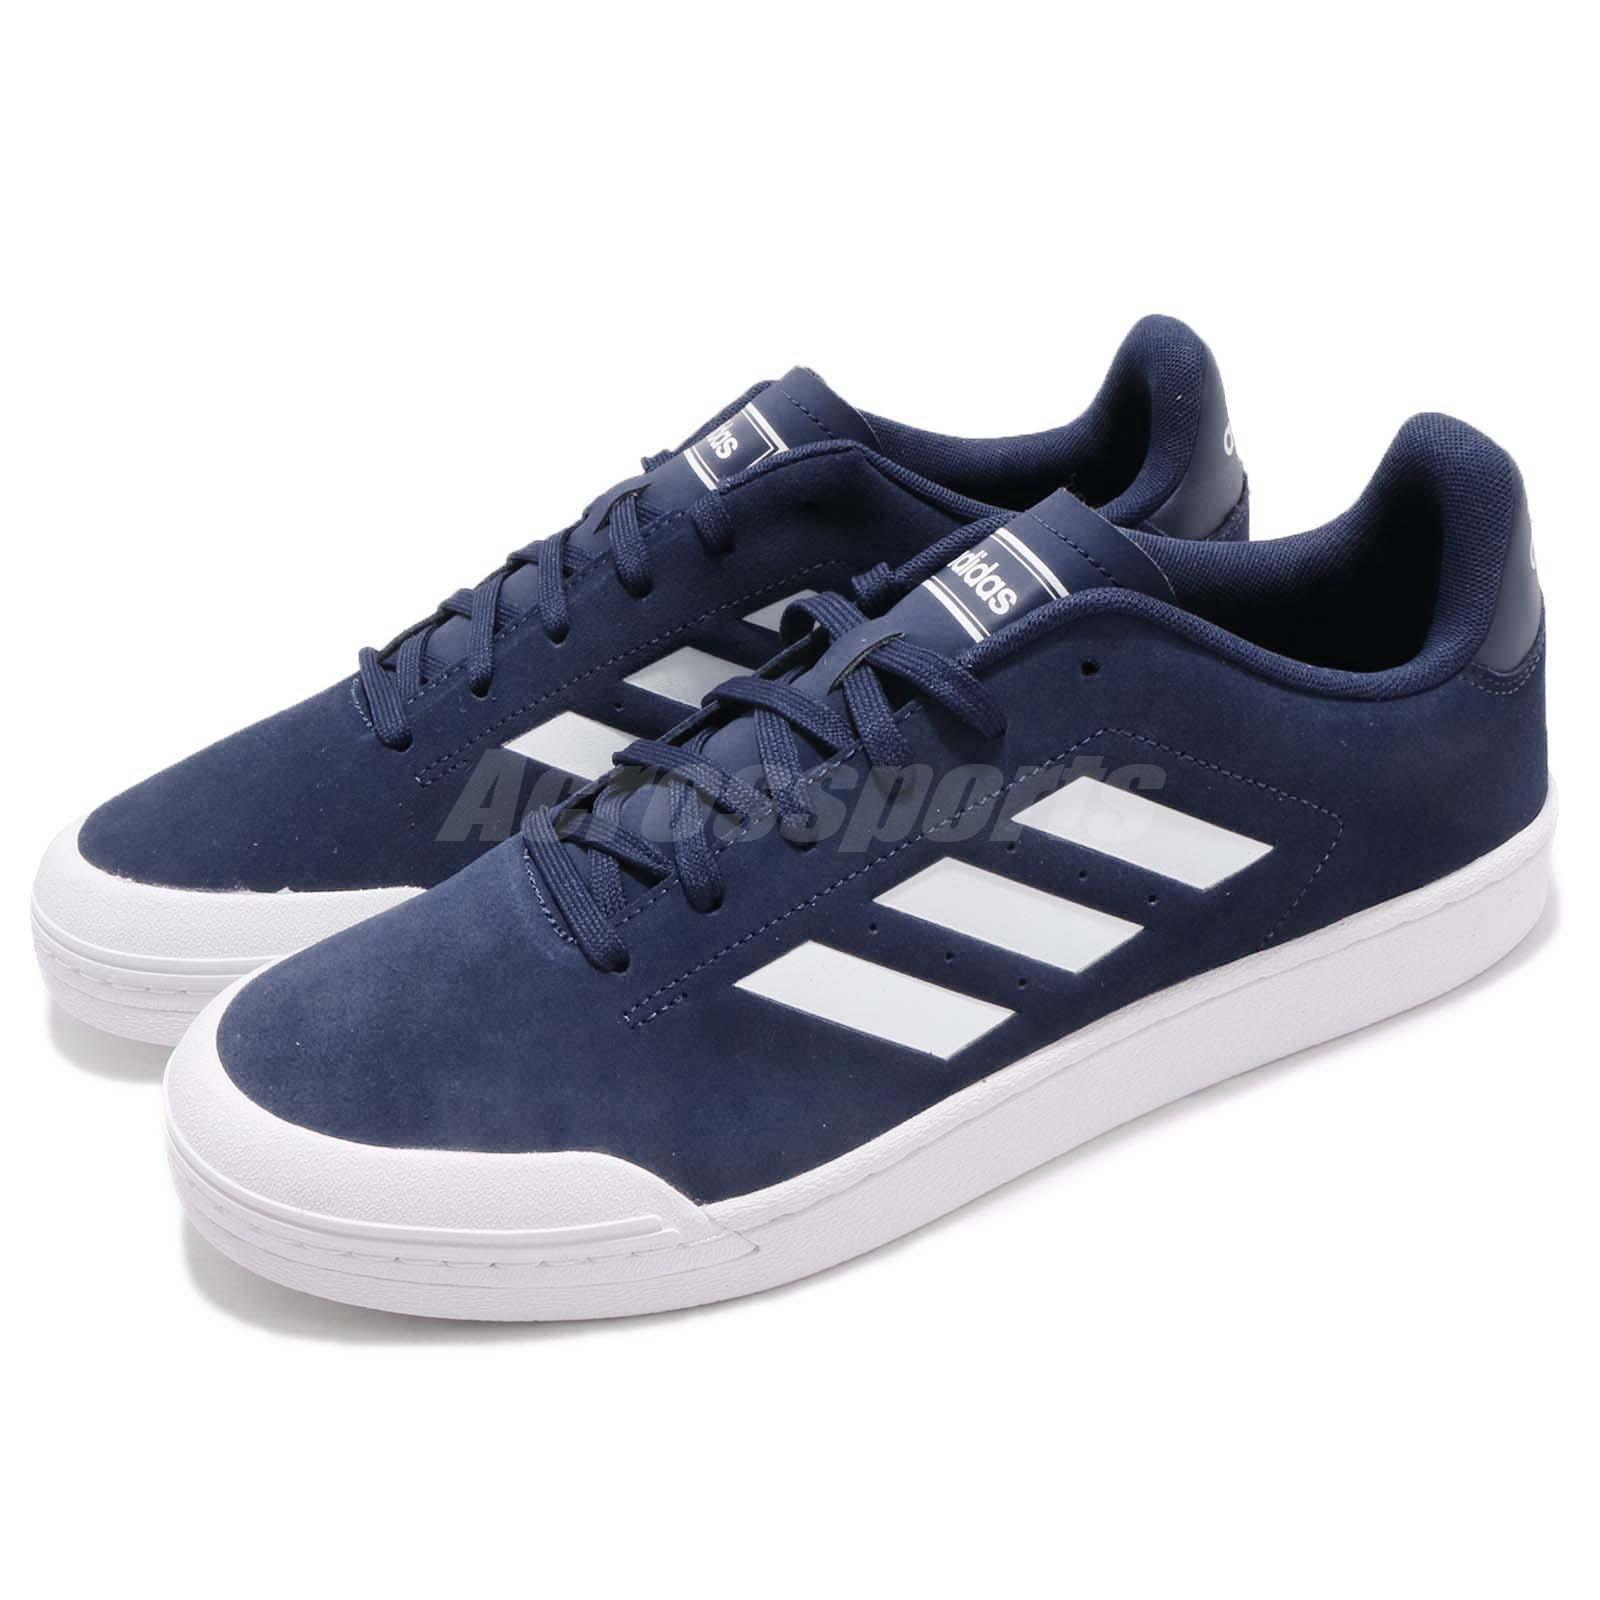 Adidas Court 70s Dark Blue White Navy Men Tennis Casual Shoes